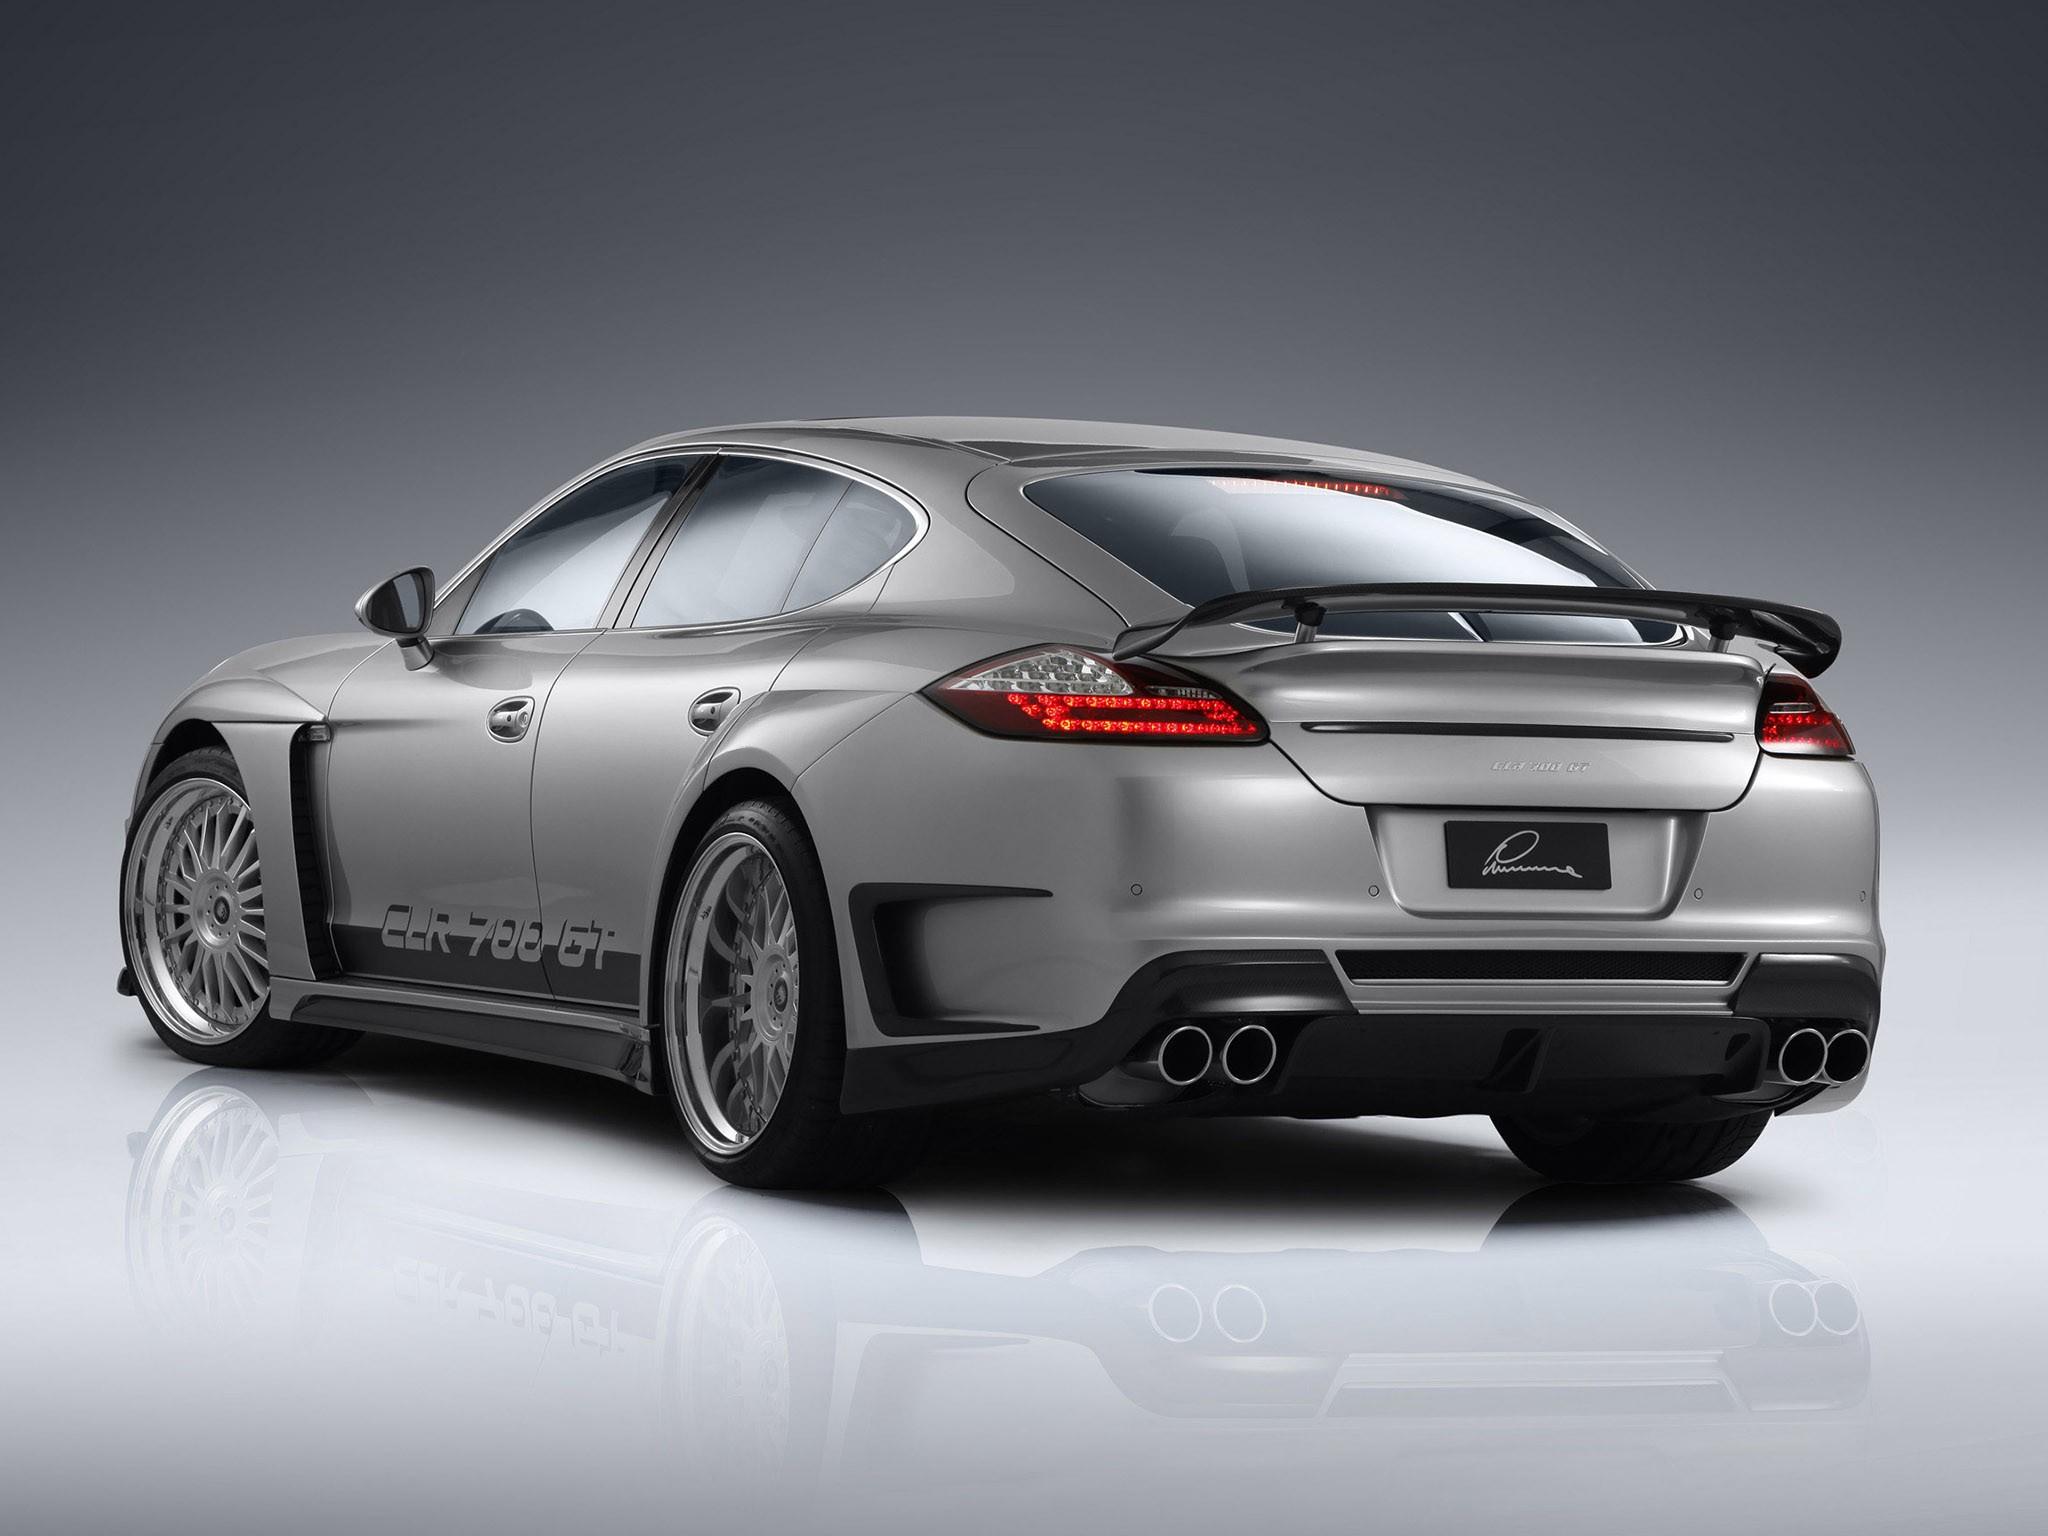 2010 Lumma Design - Porsche Panamera CLR 700 GT